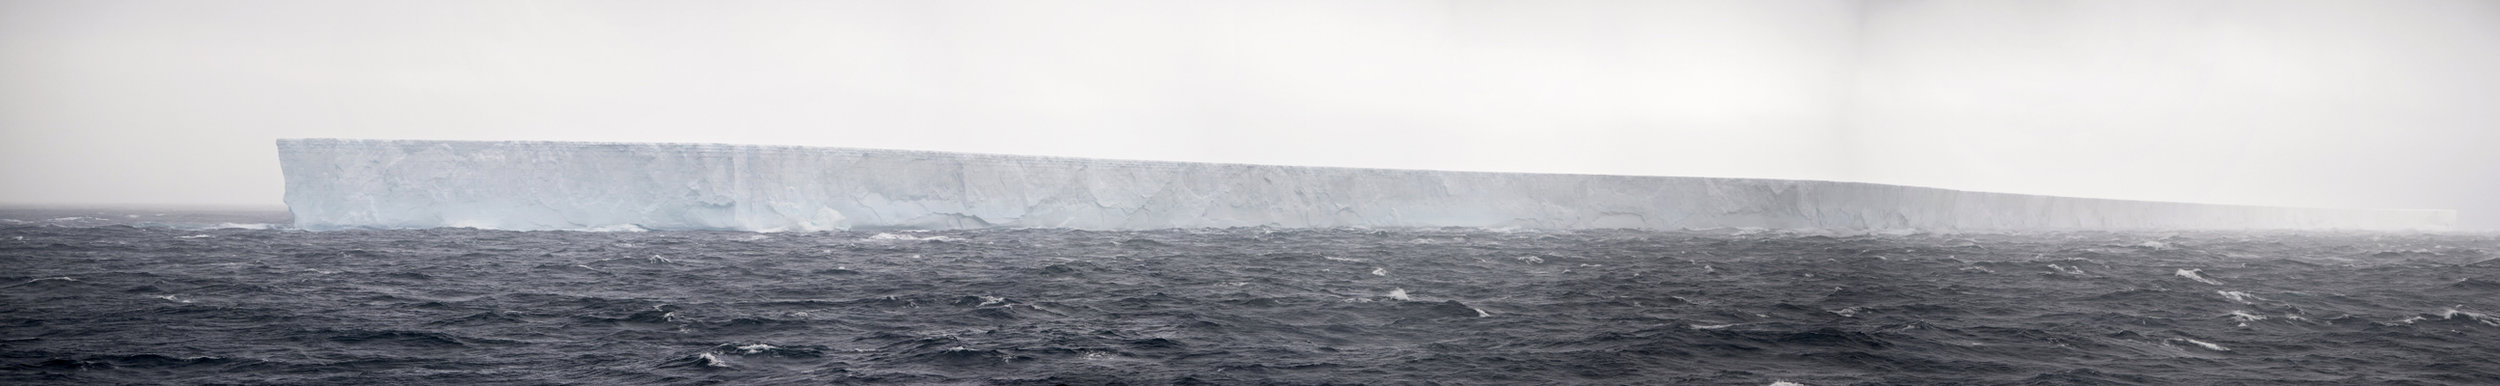 Icebergpano.jpg